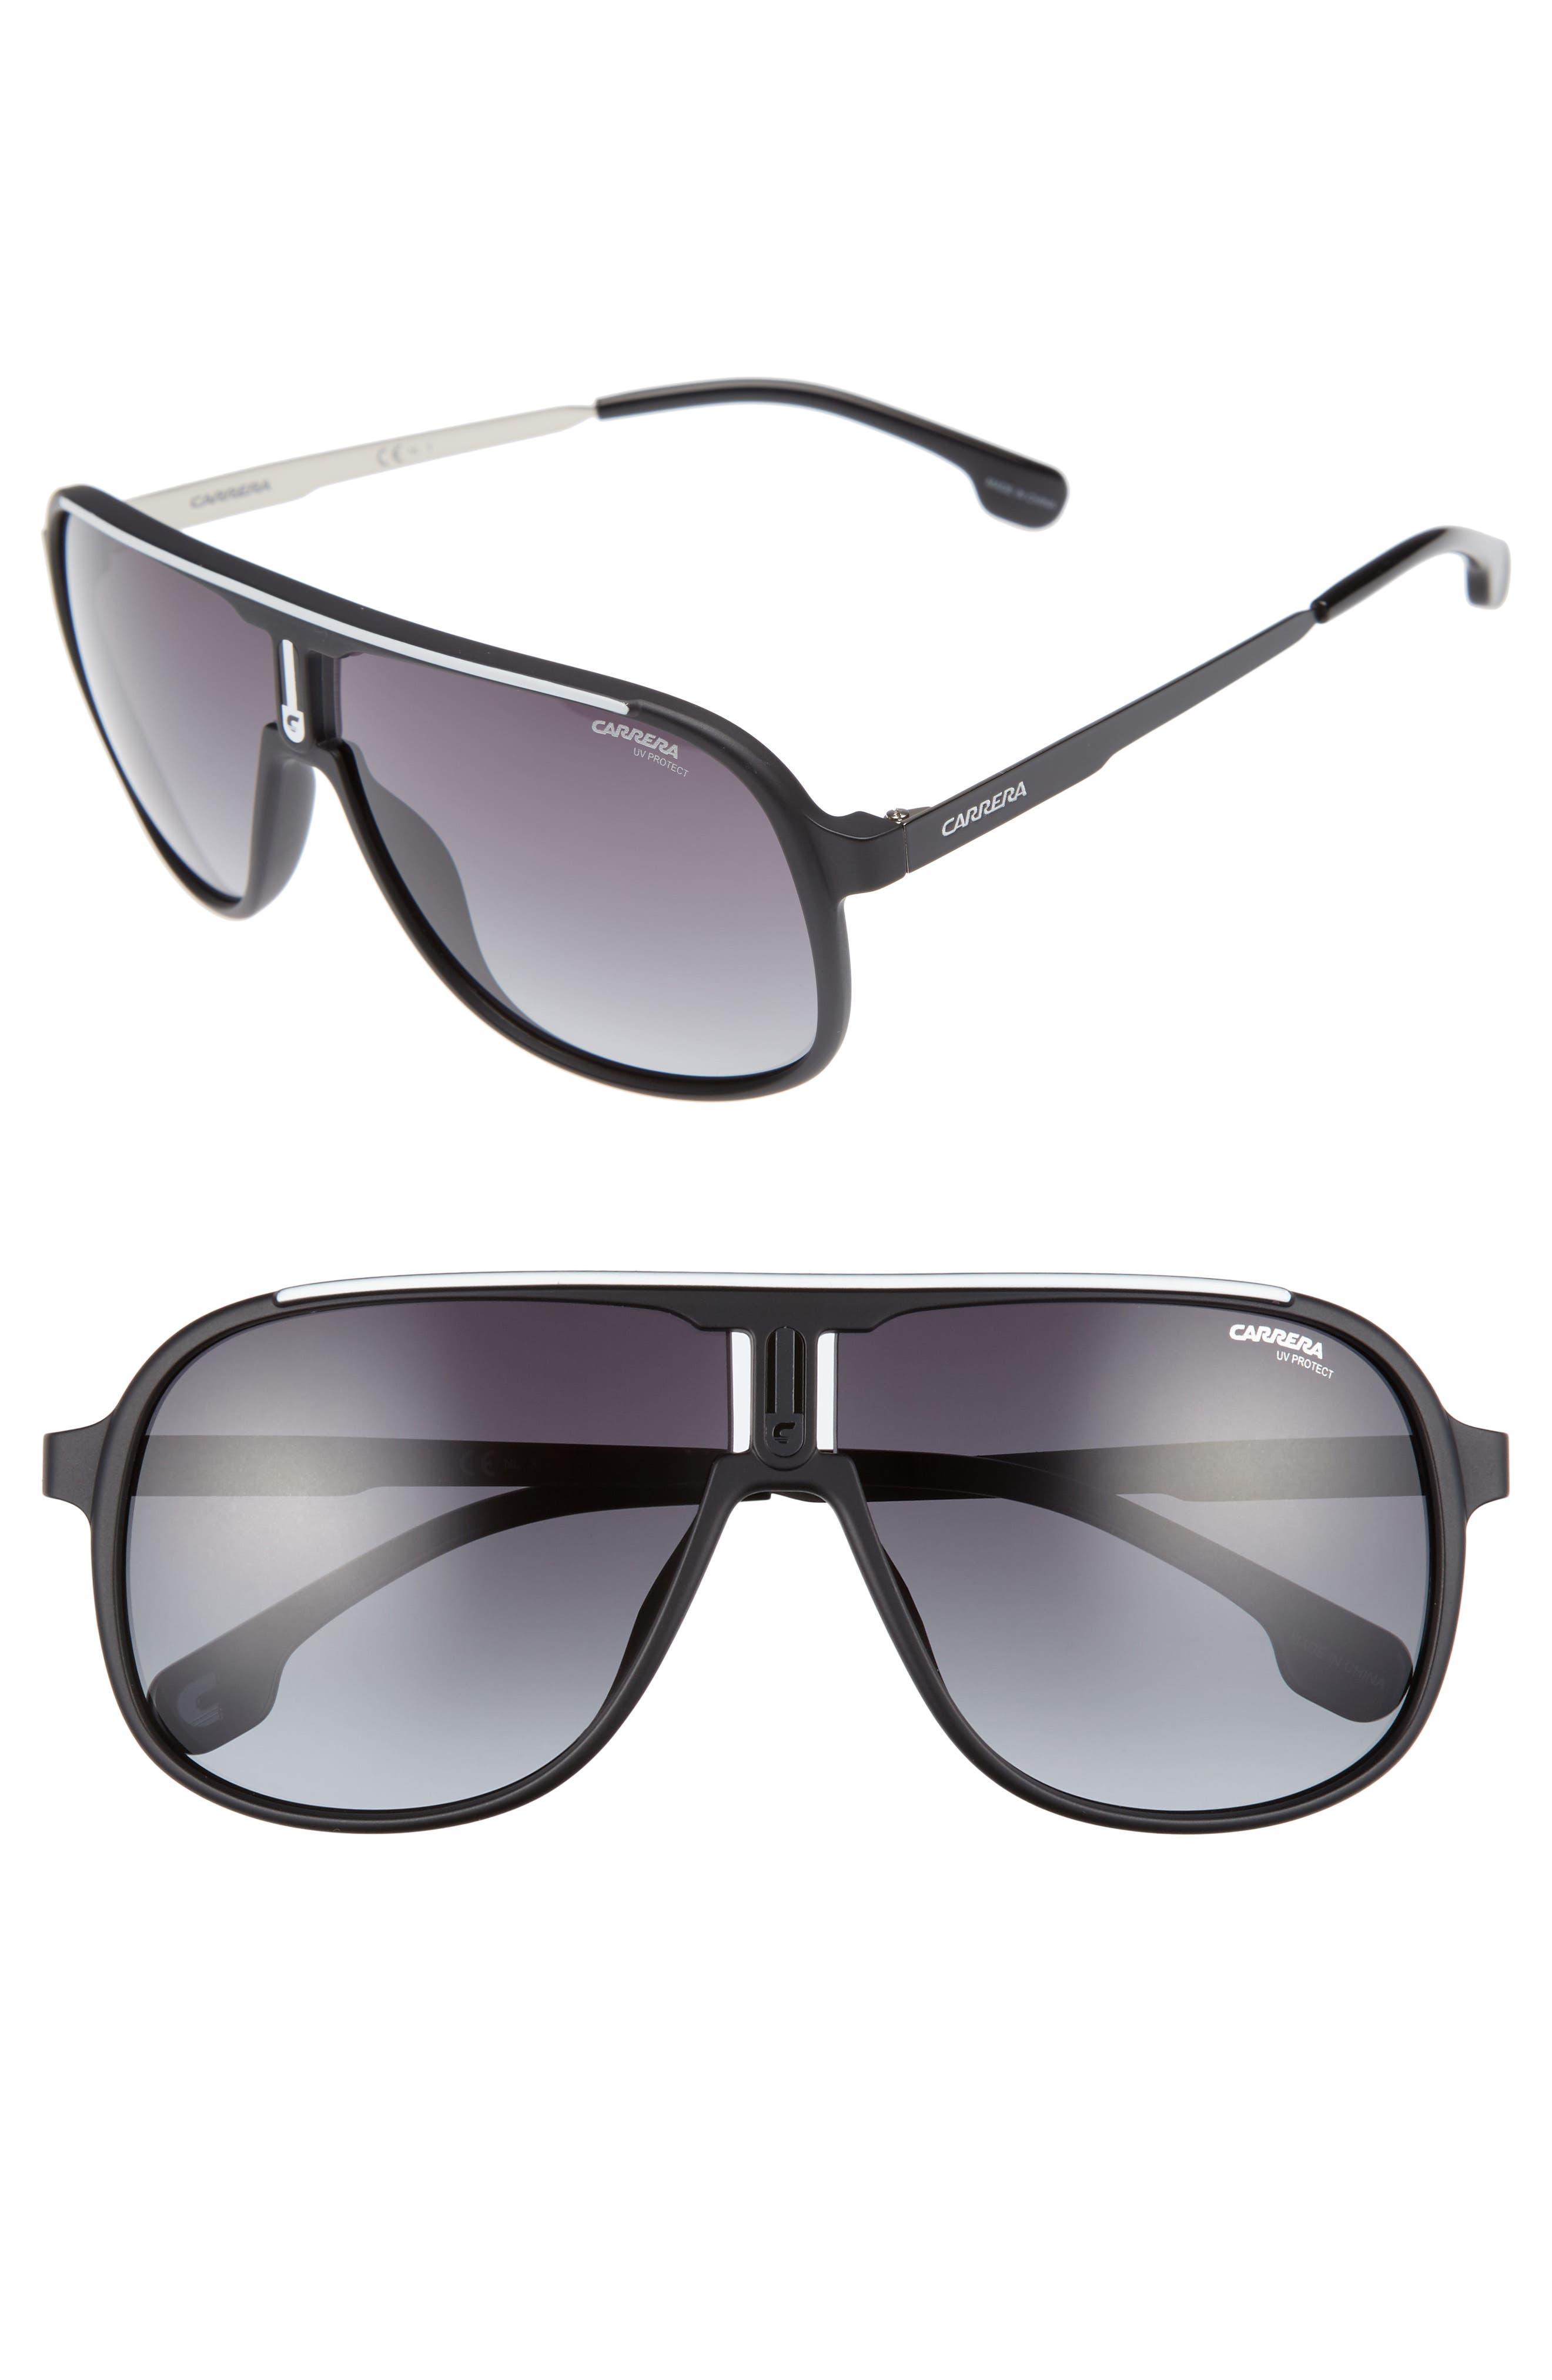 62mm Sunglasses,                             Main thumbnail 1, color,                             MATTE BLACK